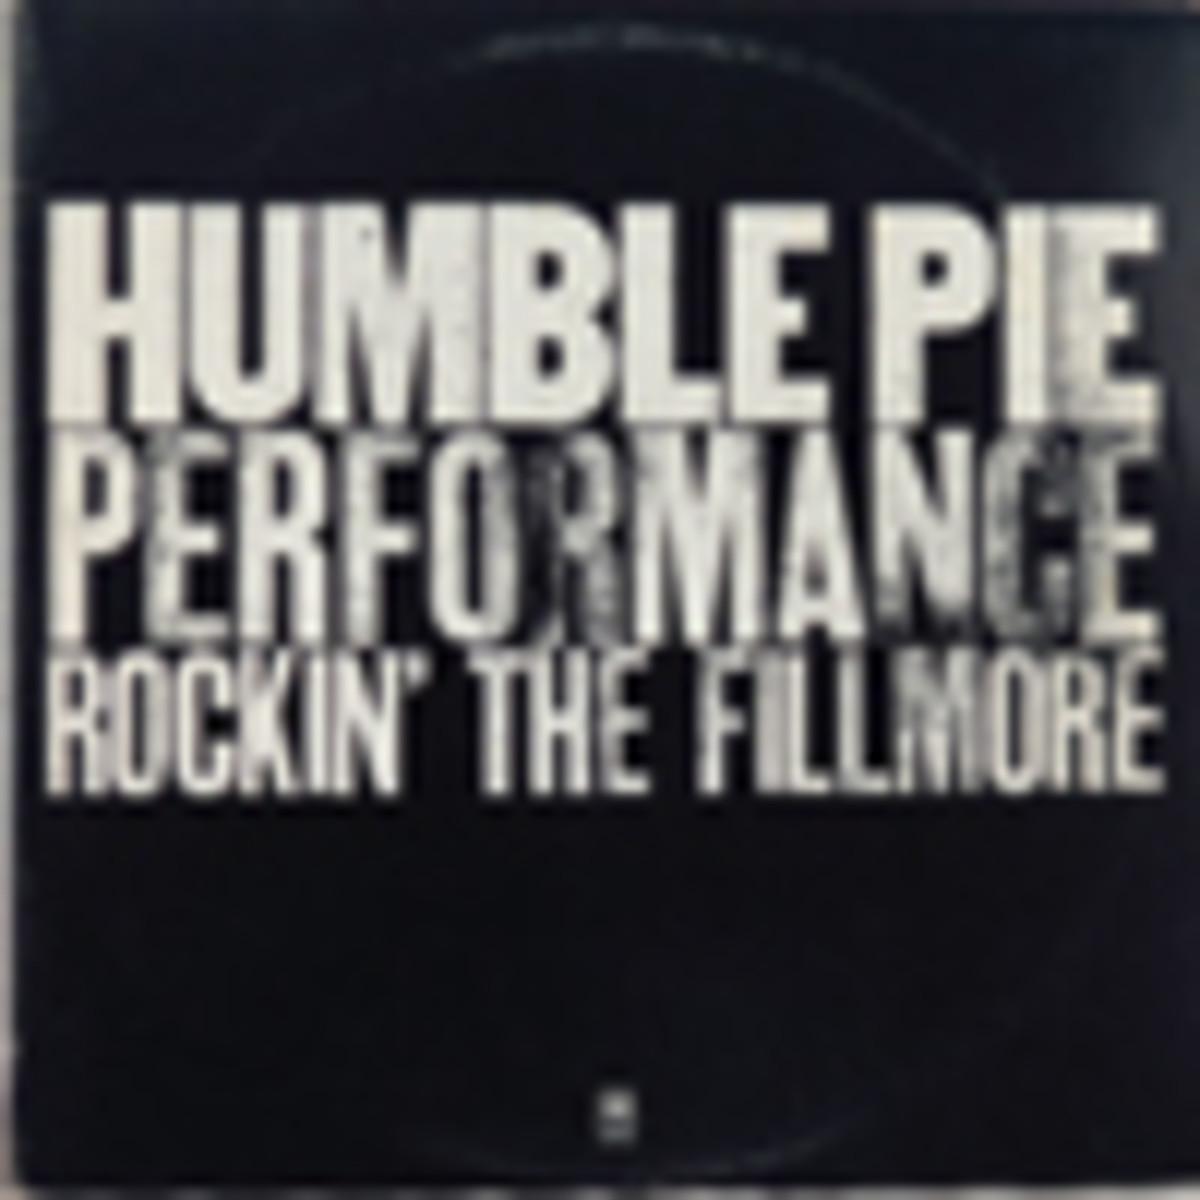 Humble Pie Rockin' The Fillmore